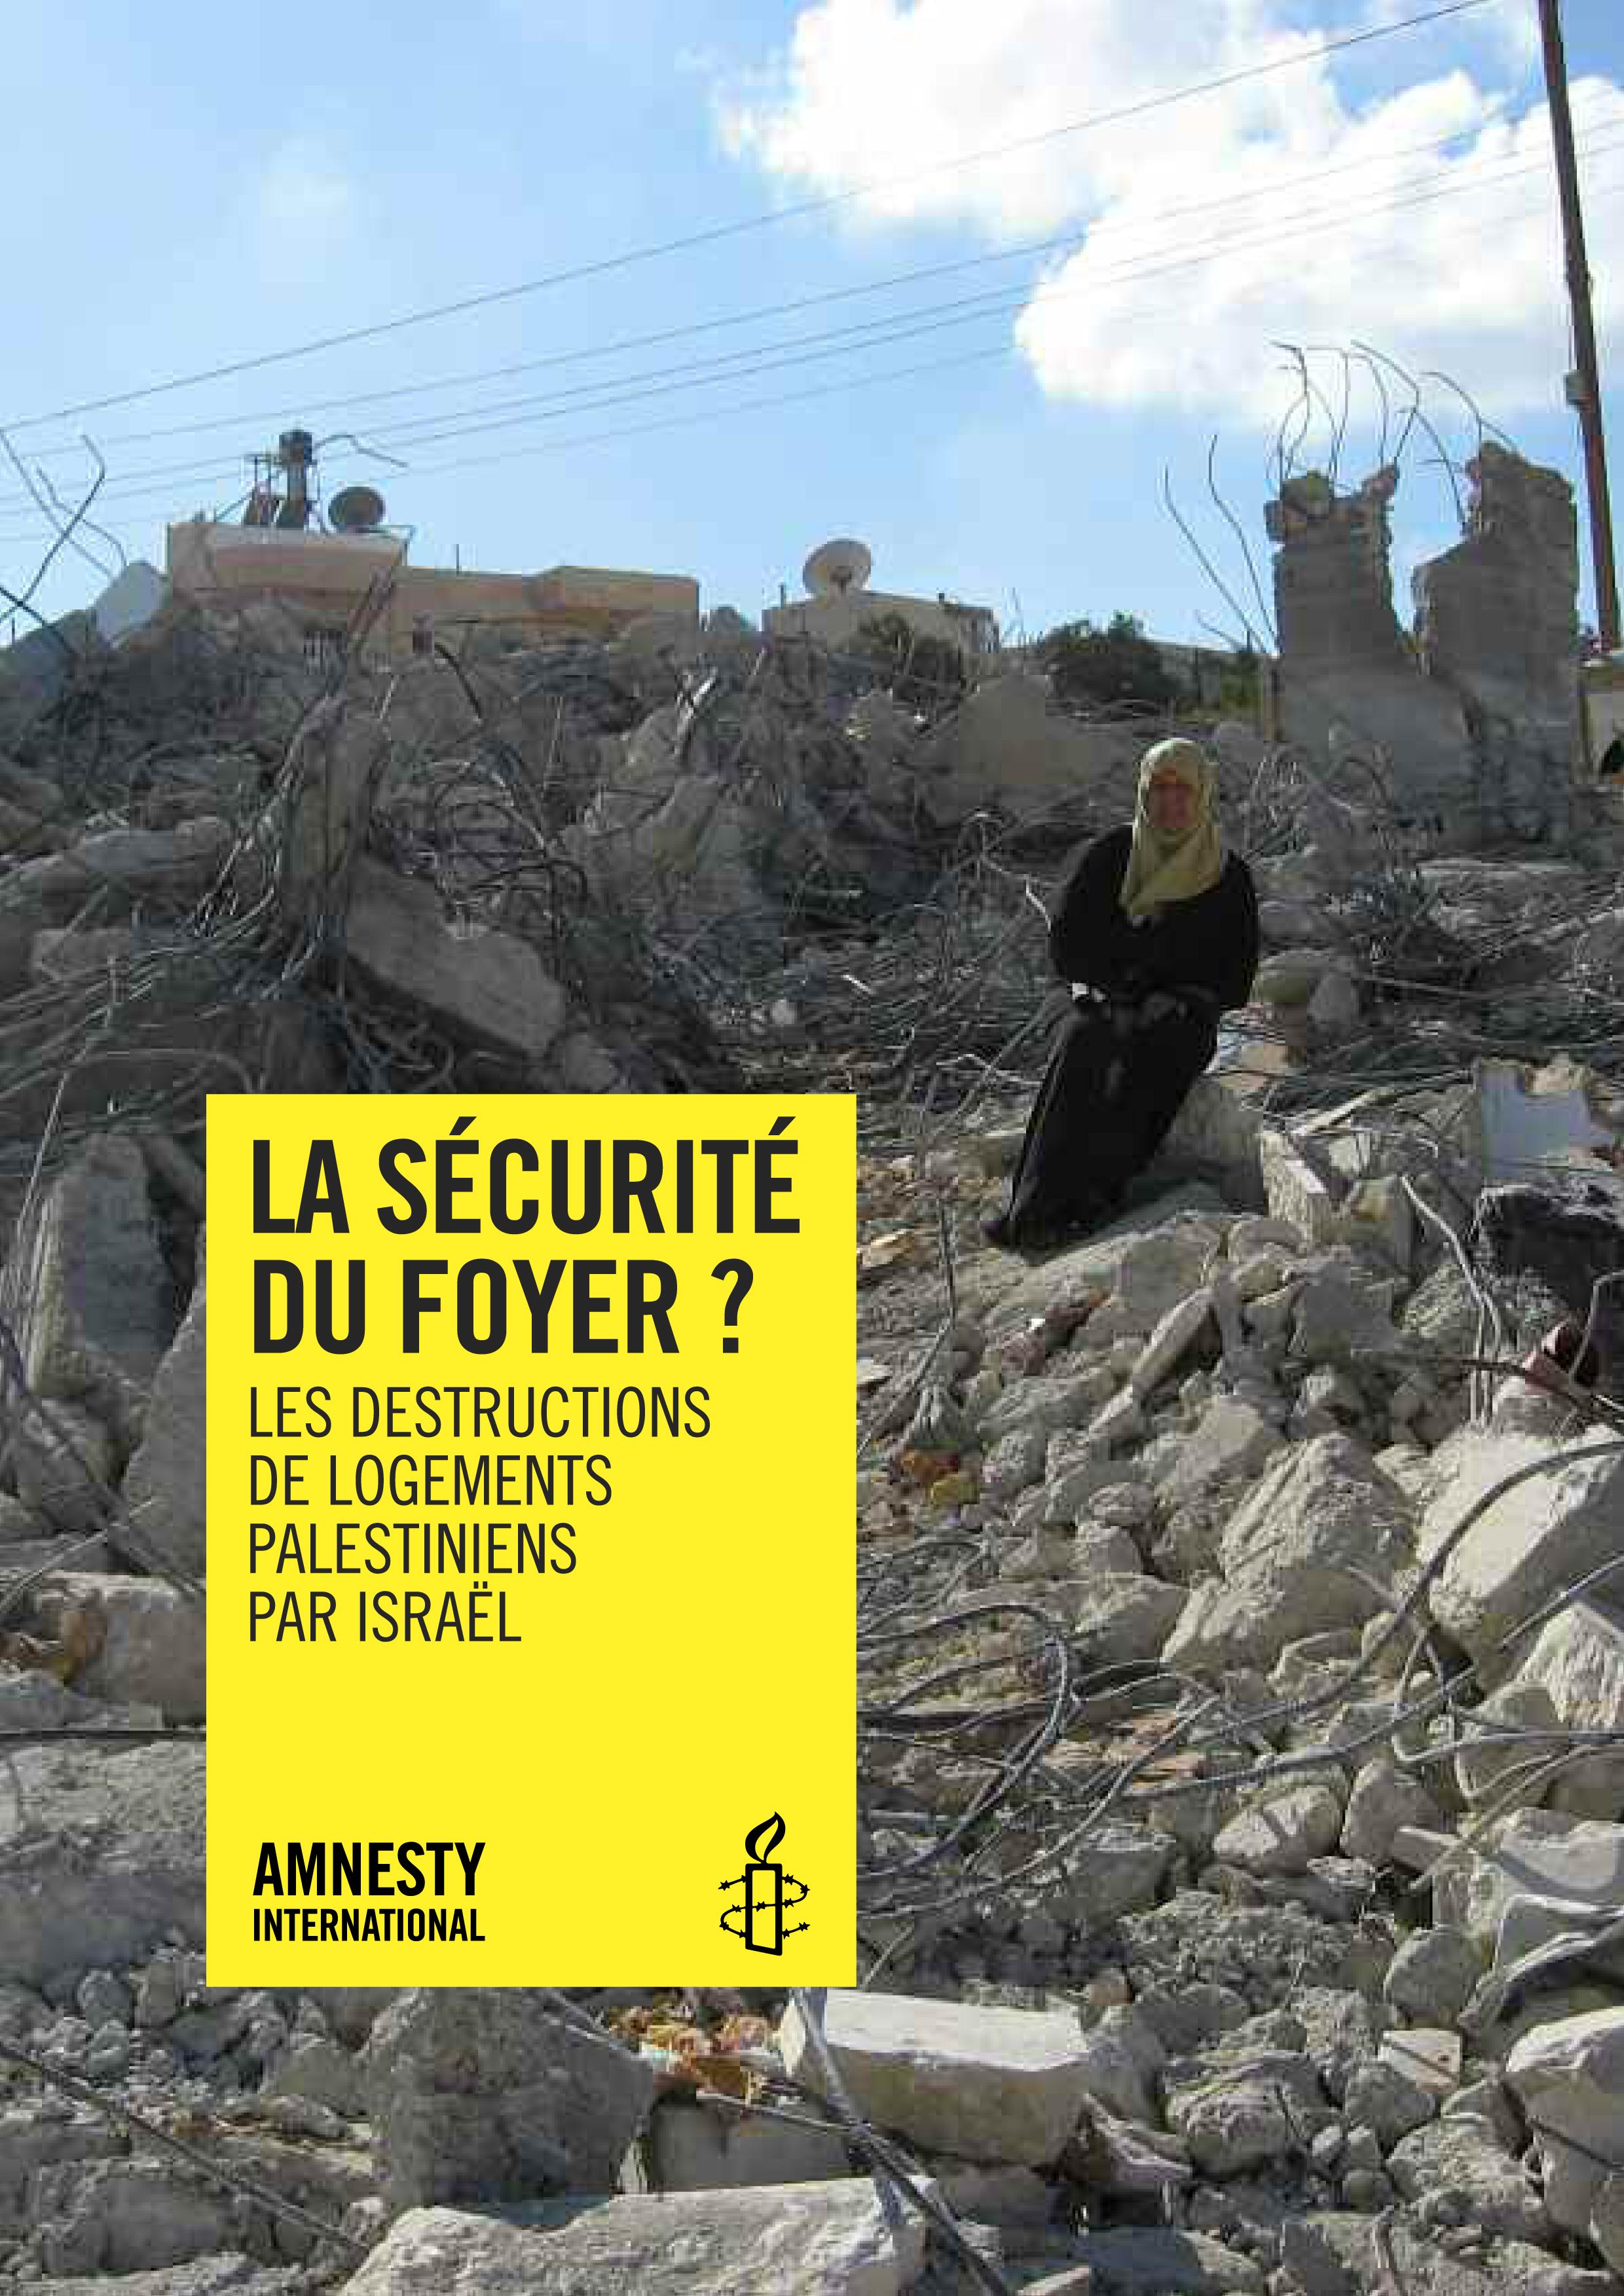 les destructions de logement palestiniens par Israël